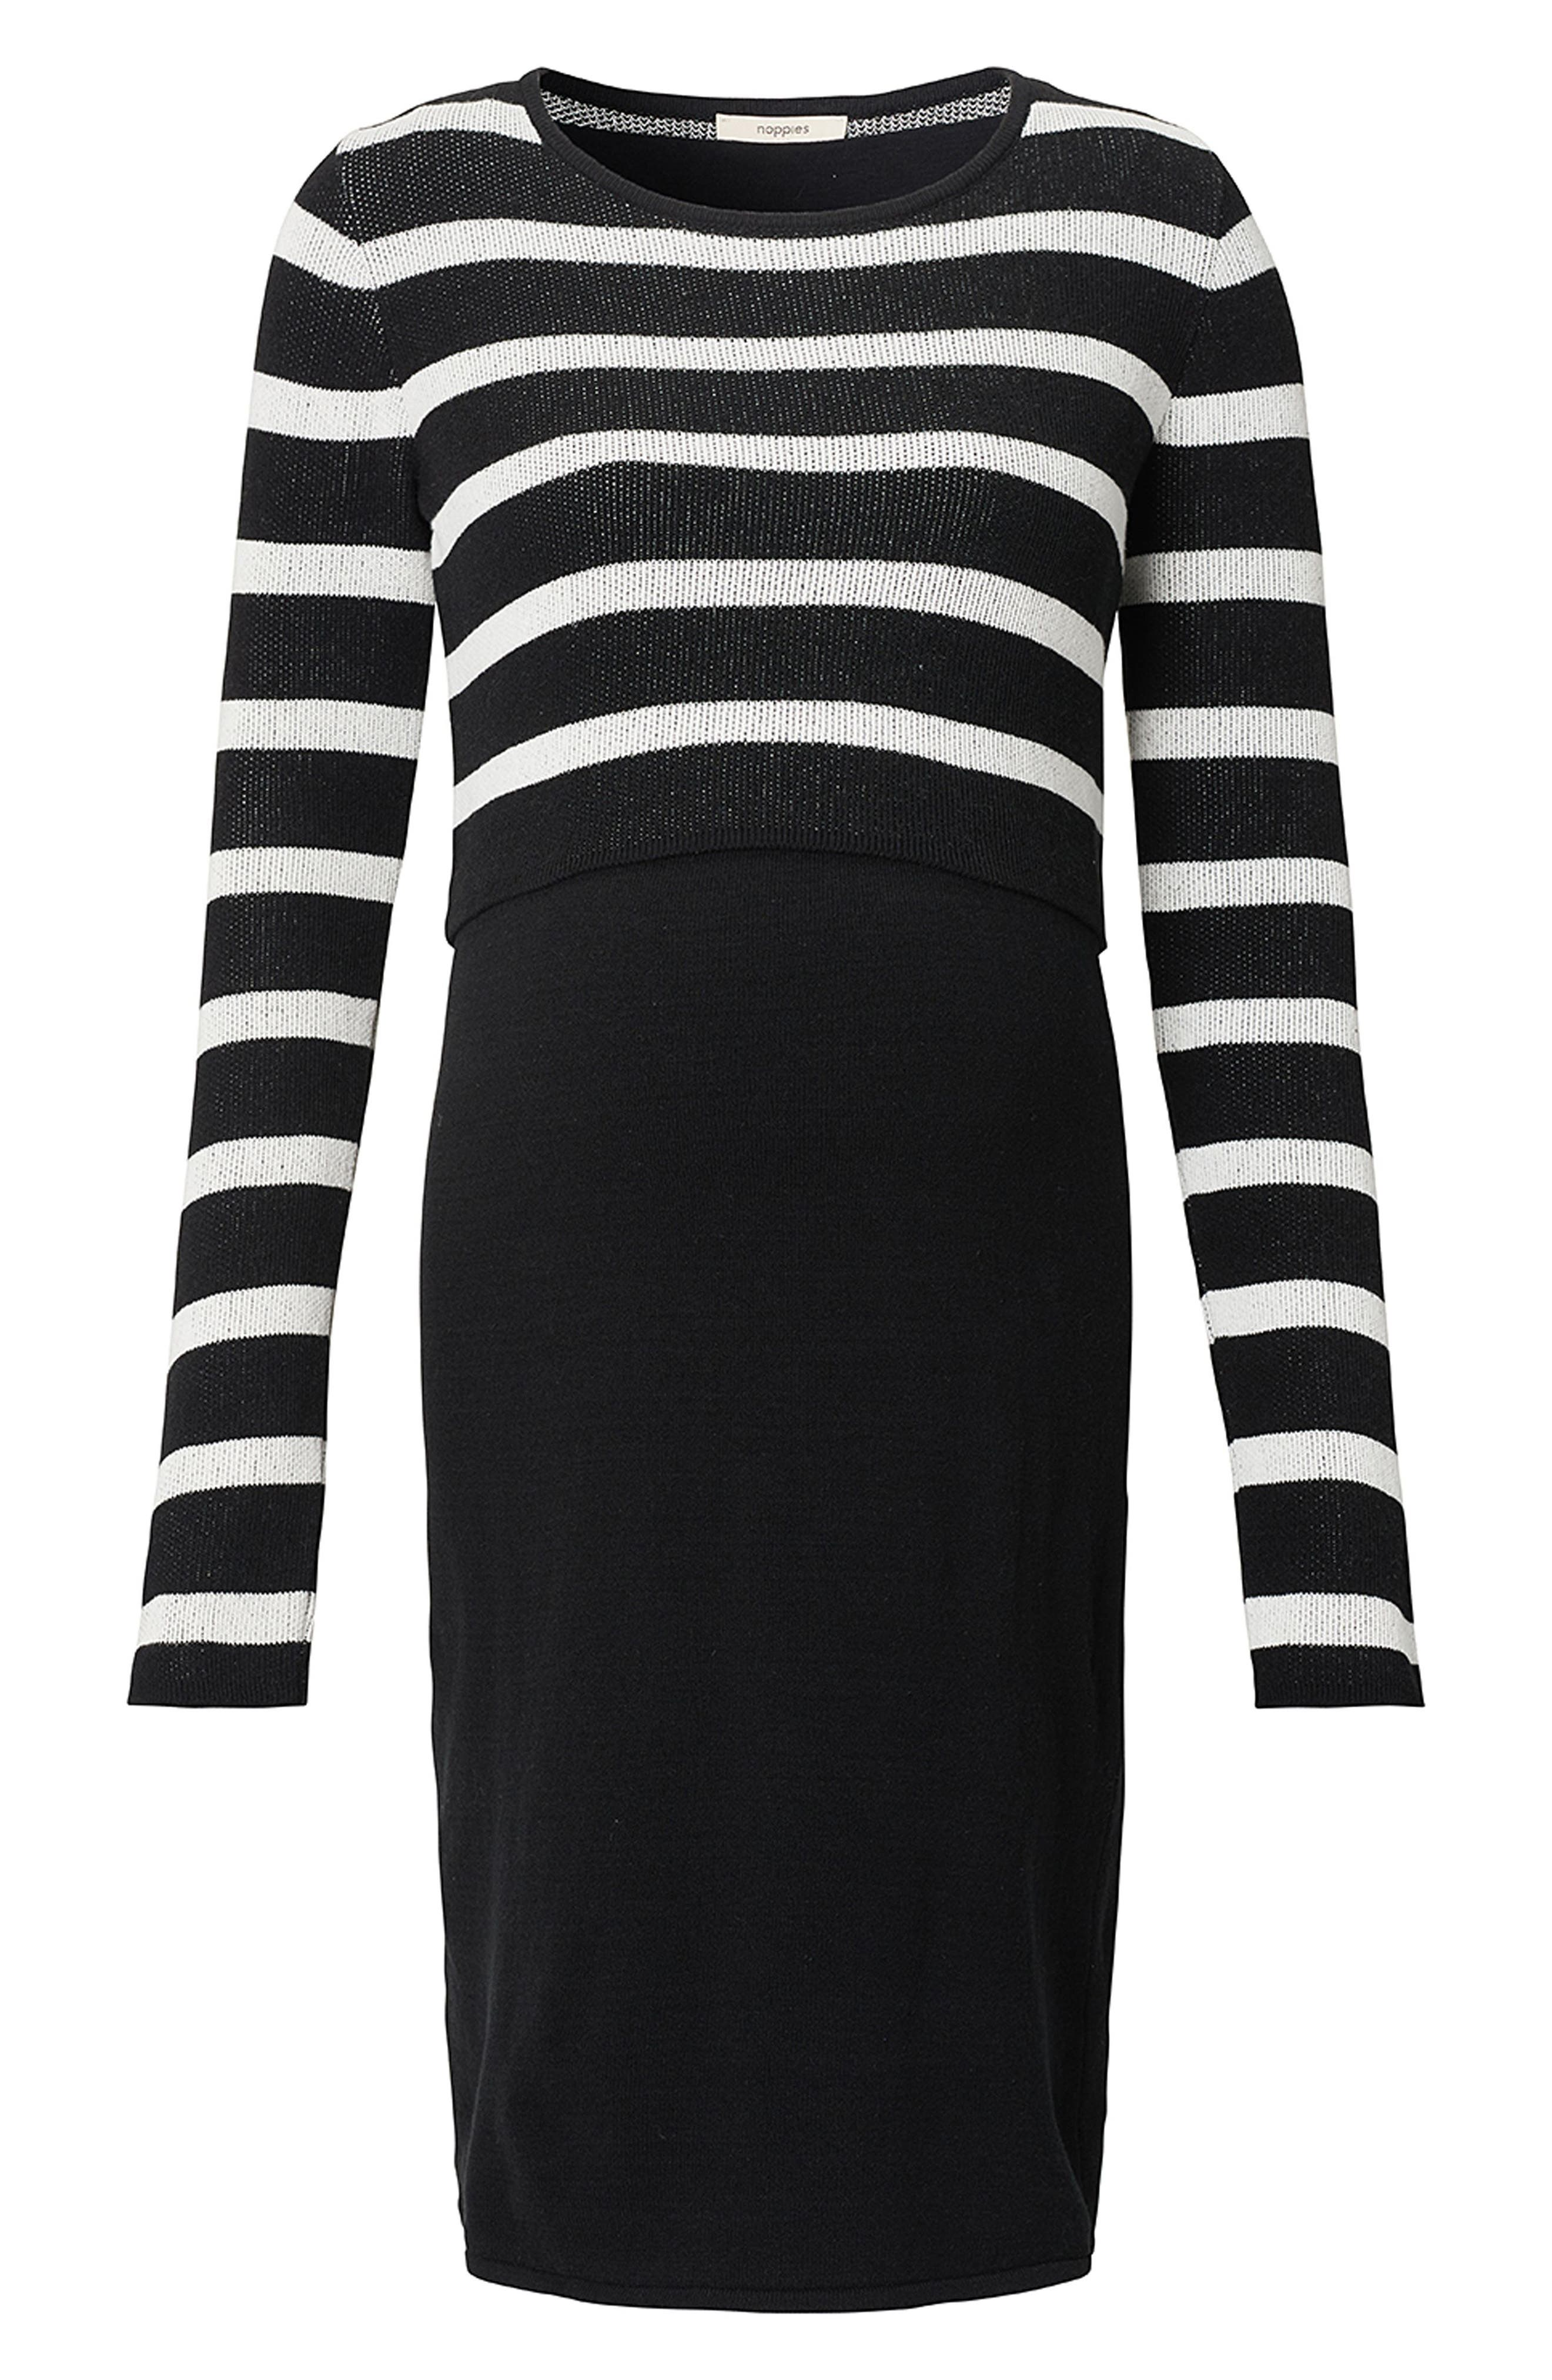 Imara Nursing/Maternity Dress,                             Alternate thumbnail 2, color,                             BLACK